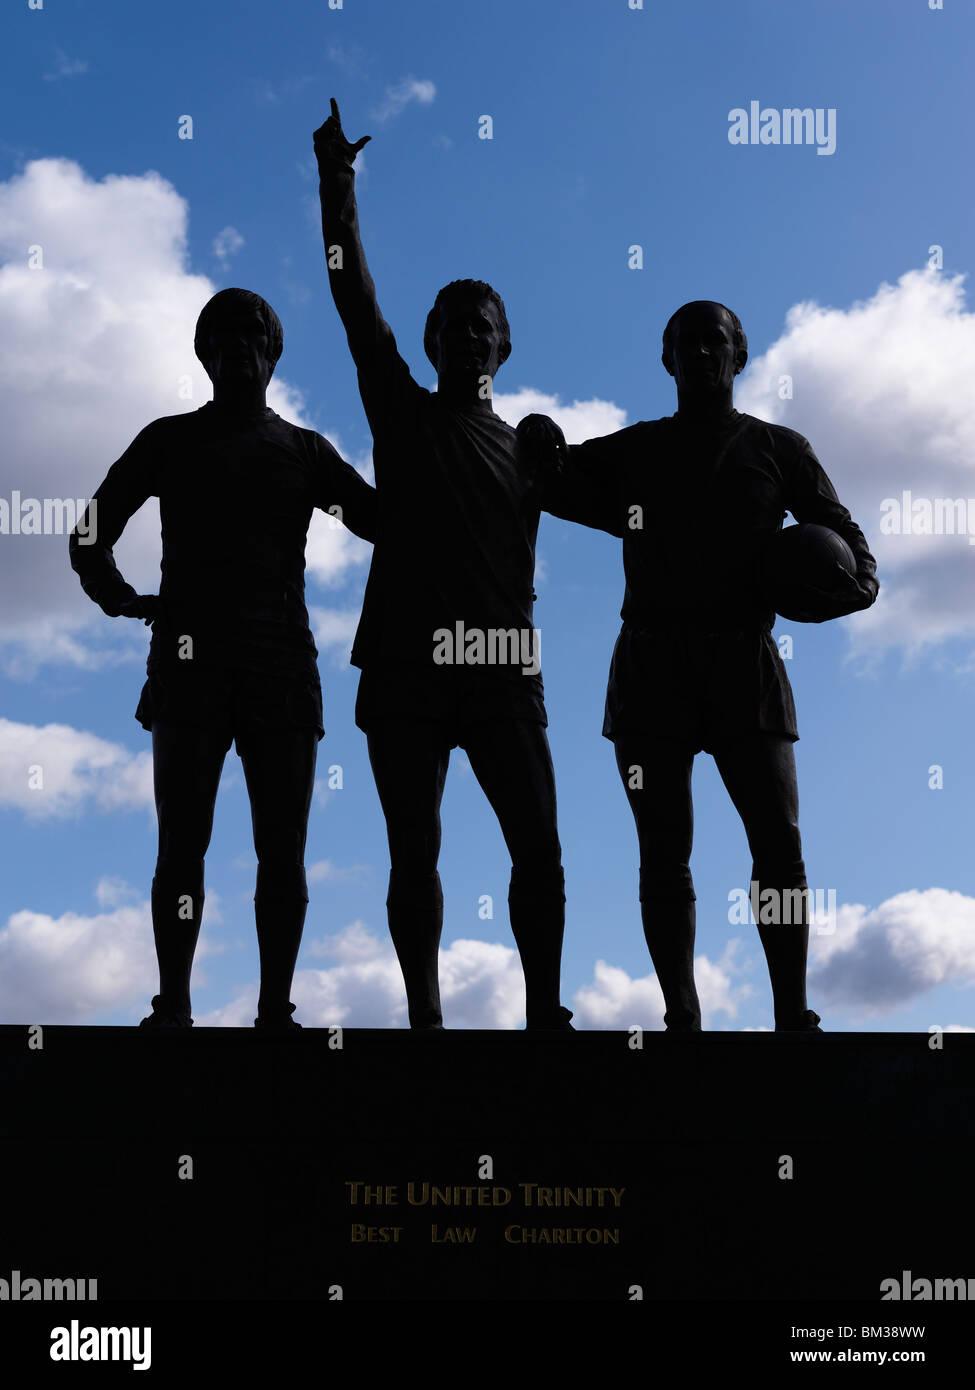 best law charlton statue old trafford stadium - Stock Image